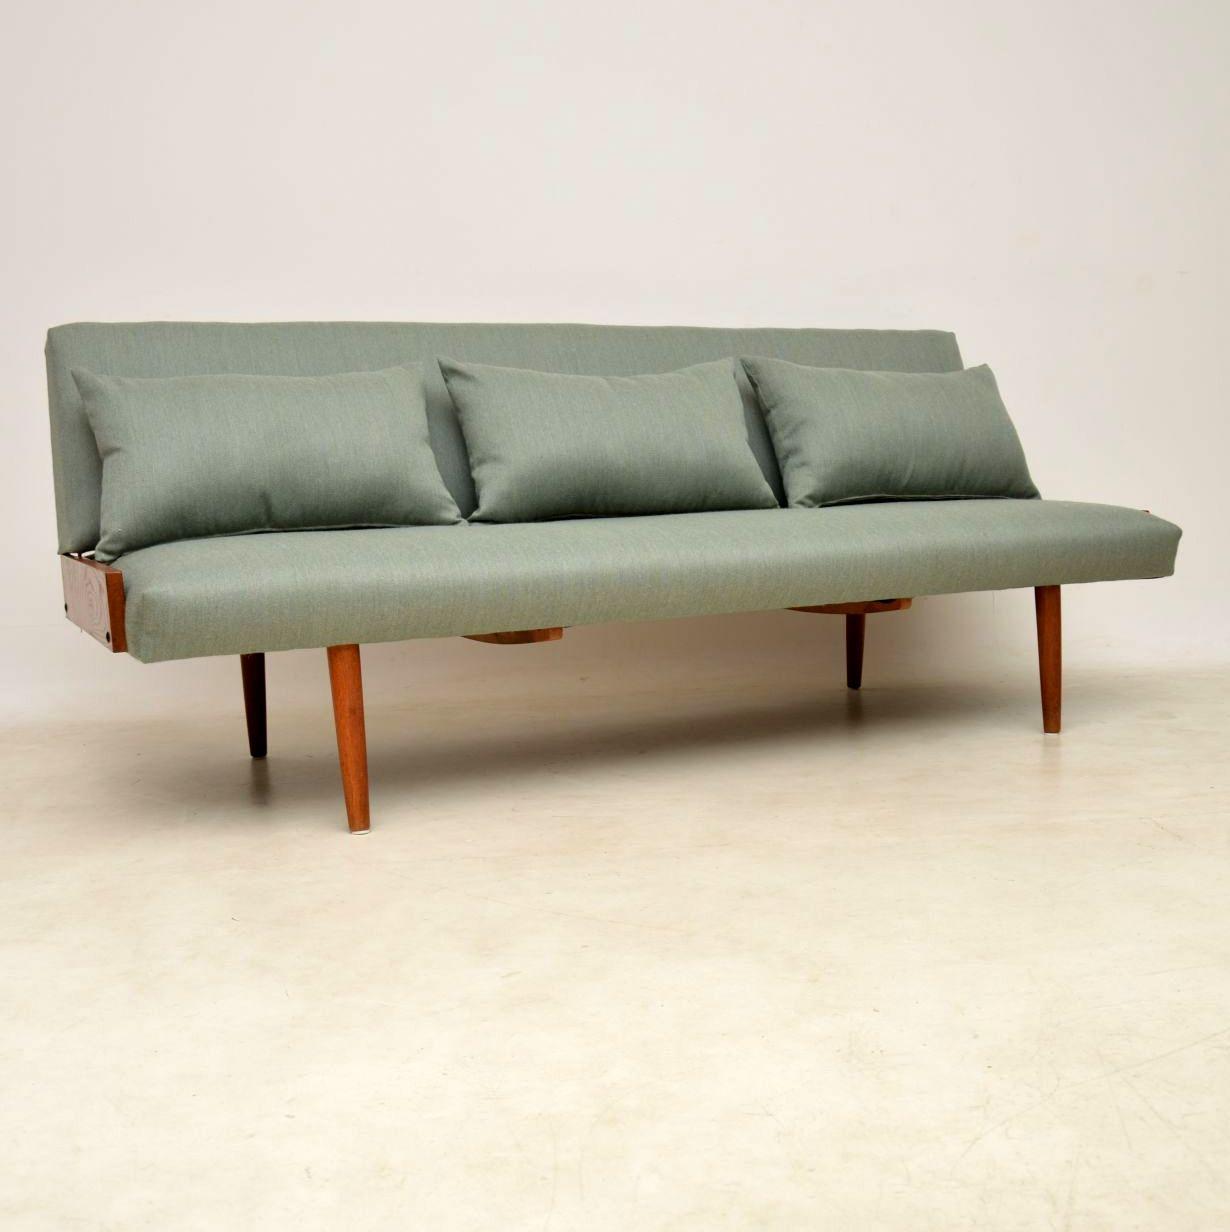 1950's Vintage Danish Sofa Bed